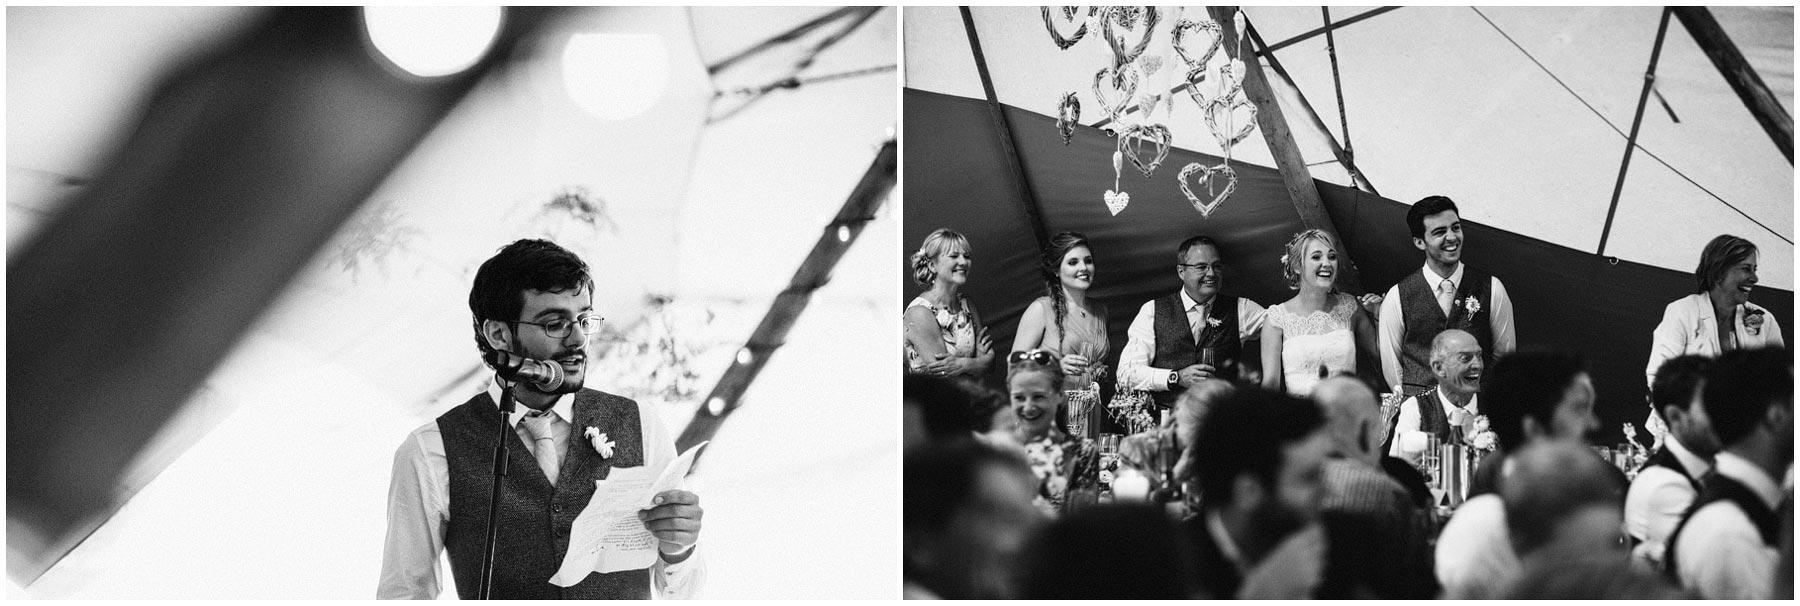 Kent-Festival-Tipi-wedding-photography_0129